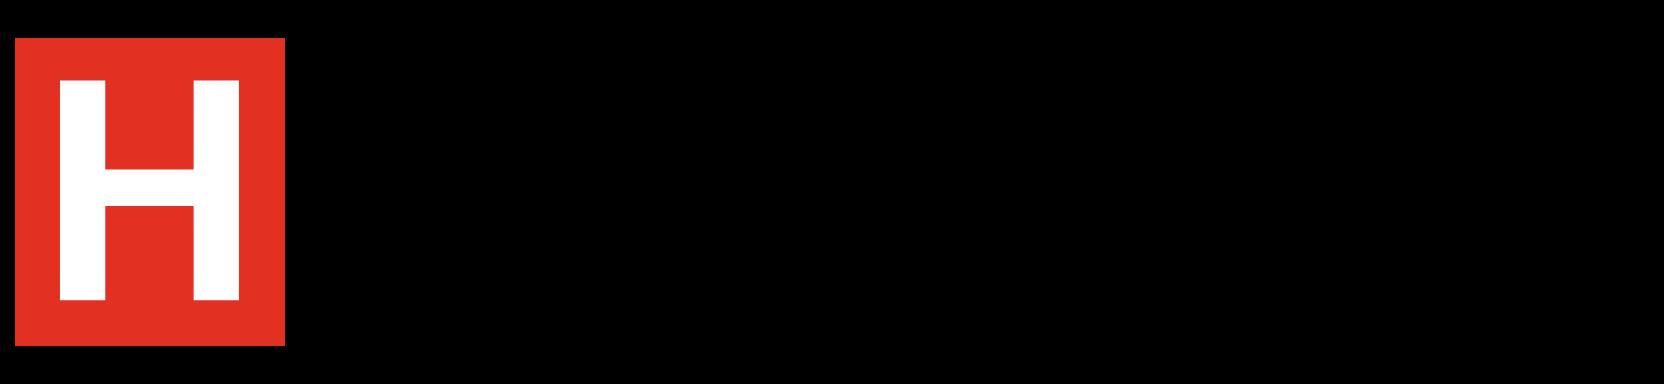 Herbkart®